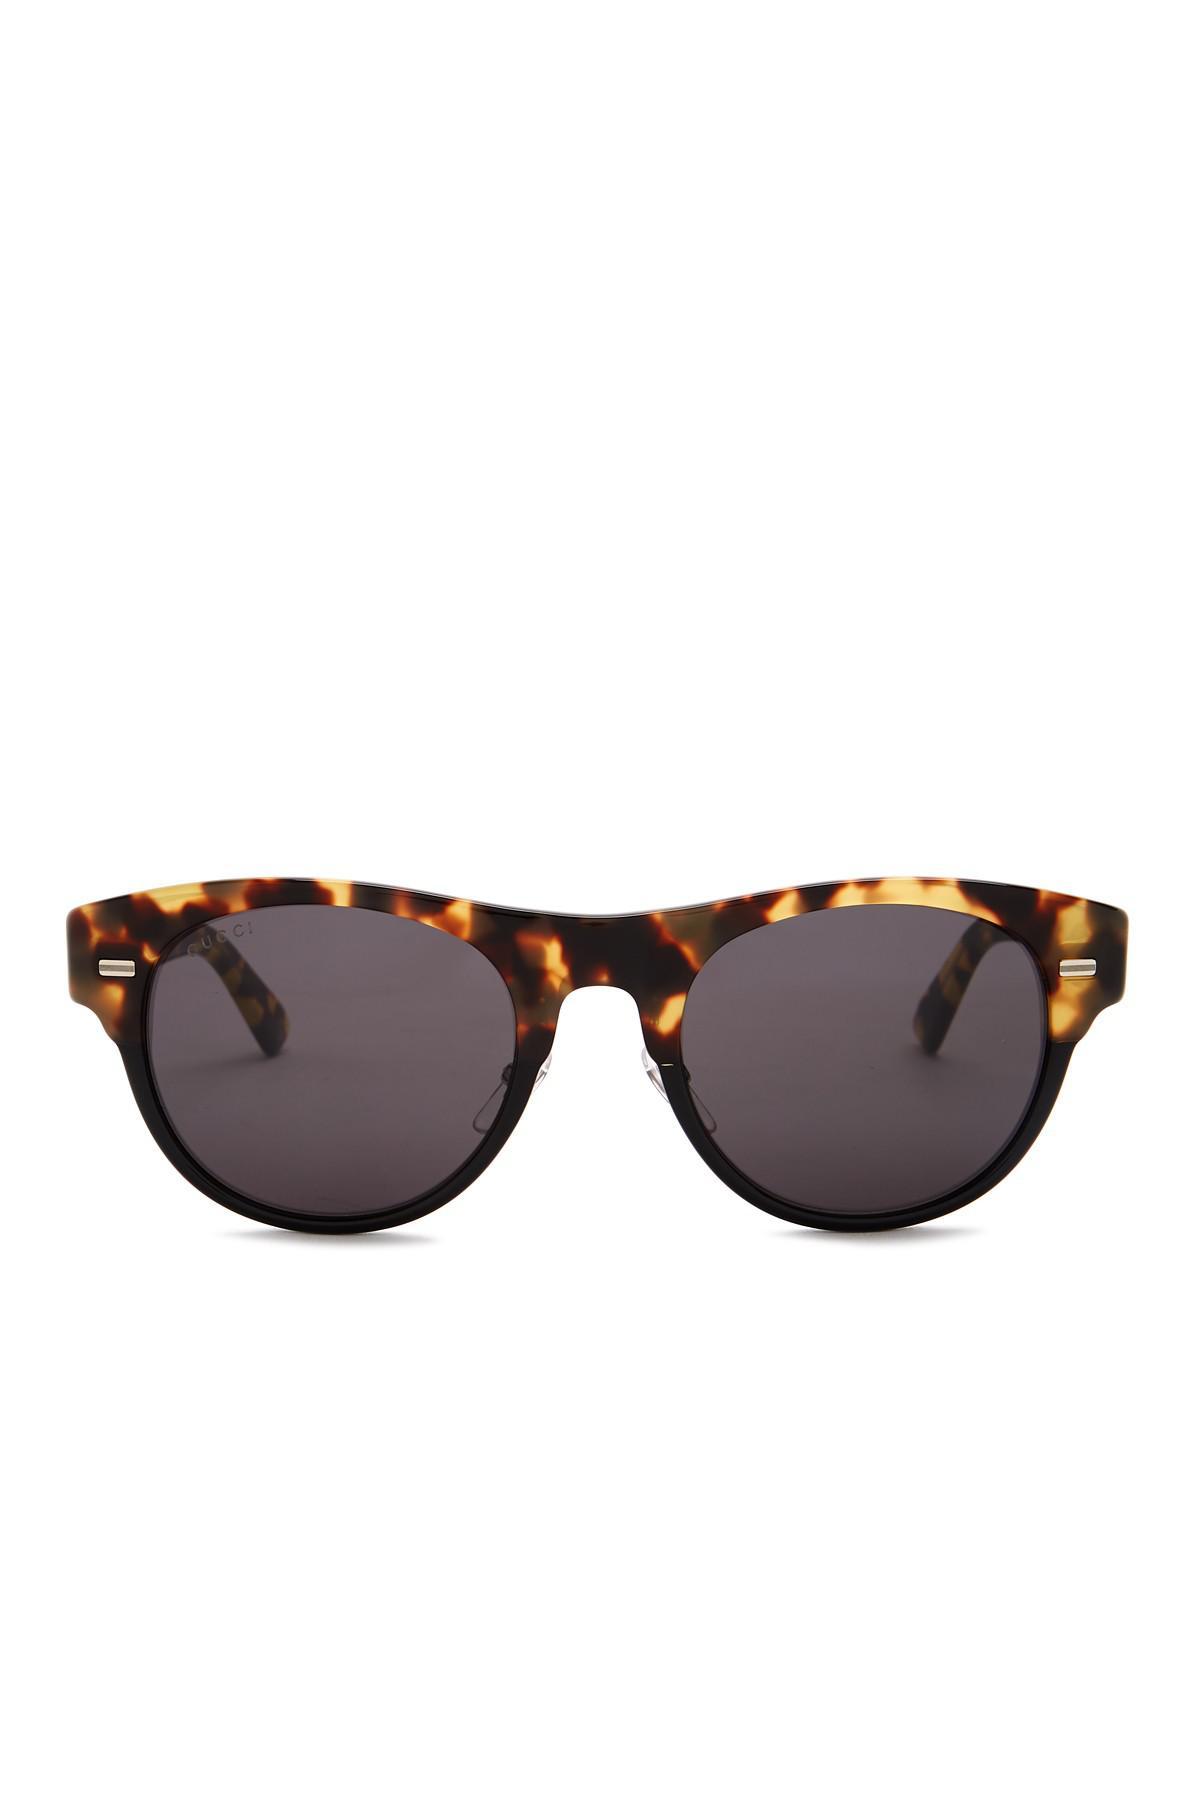 5f994763281 Lyst - Gucci 53mm Clubmaster Sunglasses for Men